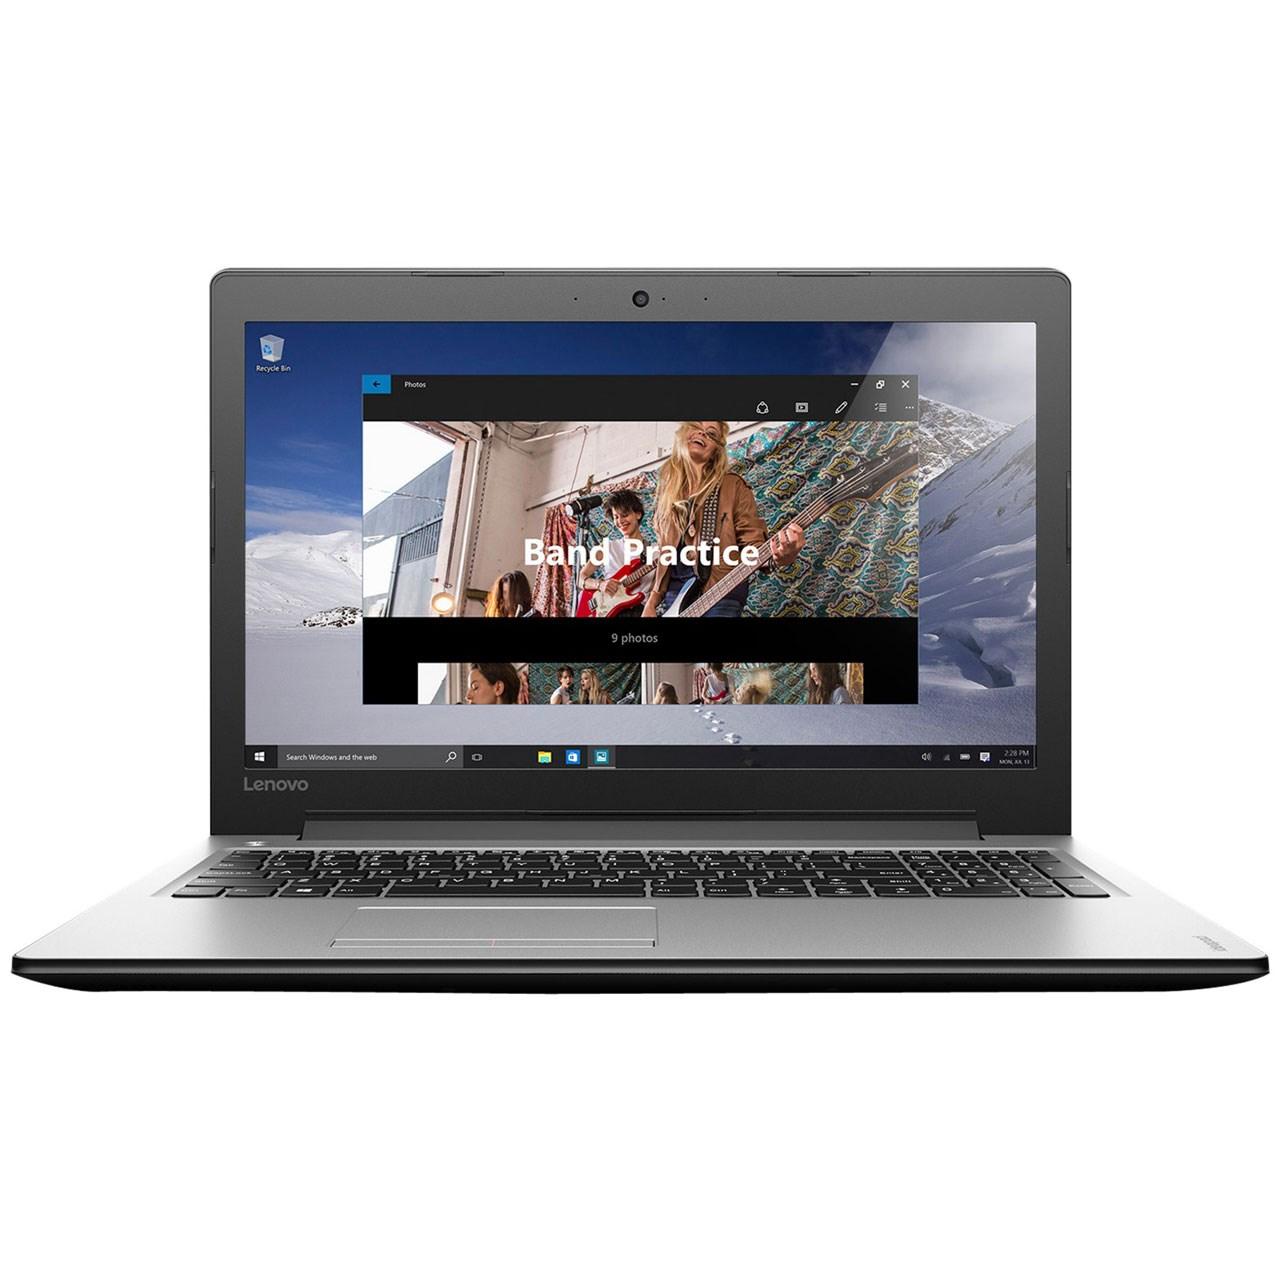 لپ تاپ 15 اینچی لنوو مدل Ideapad 320 - AX |